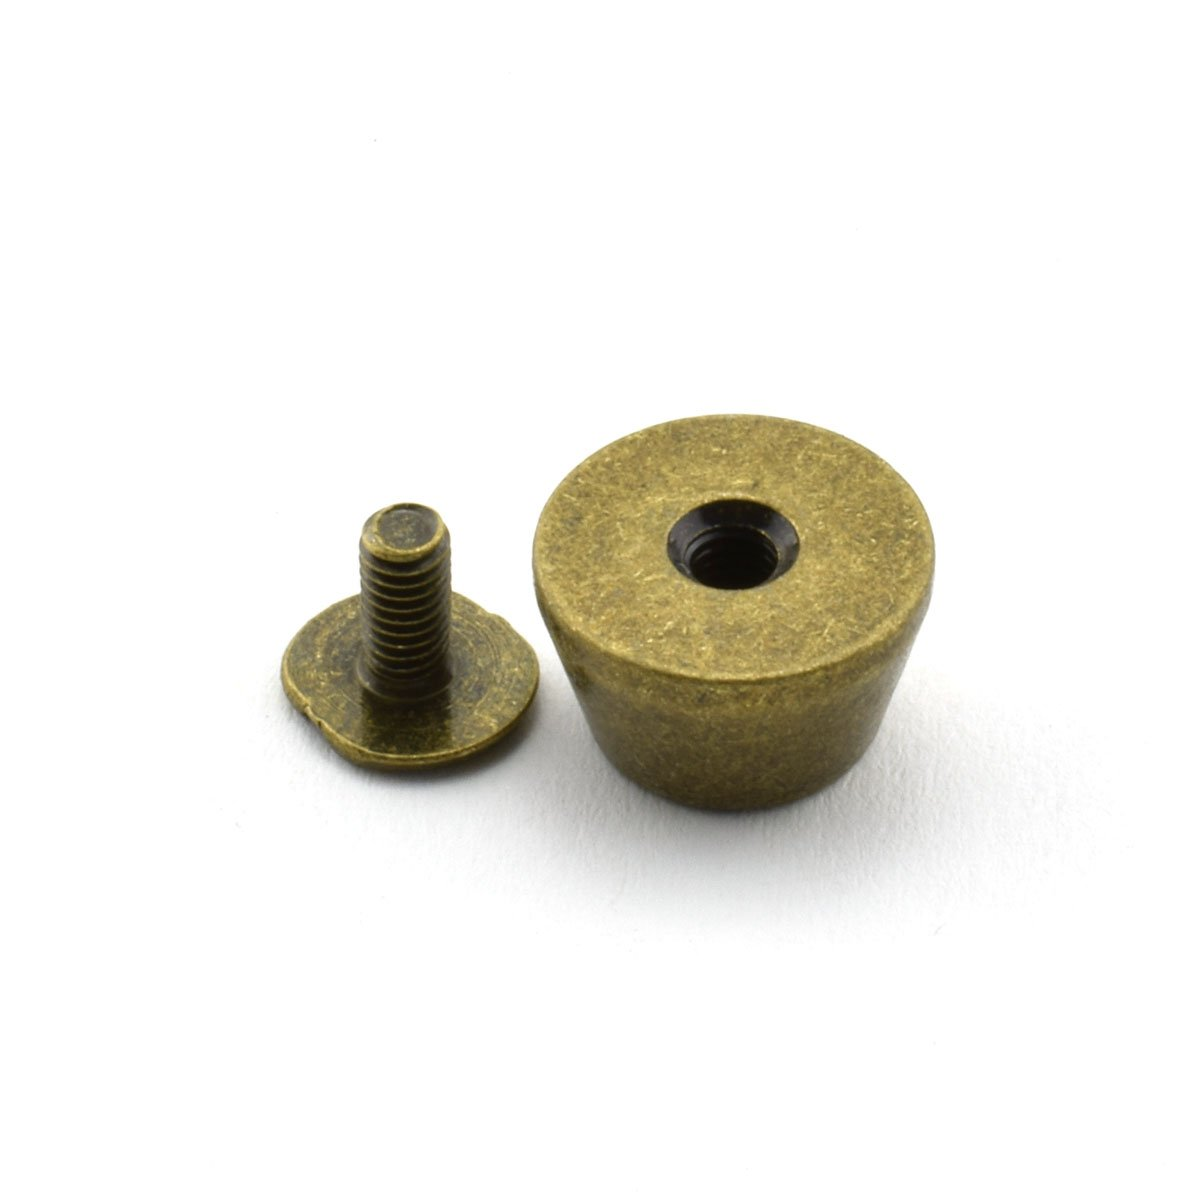 LQ Industrial 25-Pack 1//2 Purse Handbag Feet Nailhead Flat Stud Solid Brass Screw-Back Spike Metal Cone Studs Rivet Leather Craft DIY Black